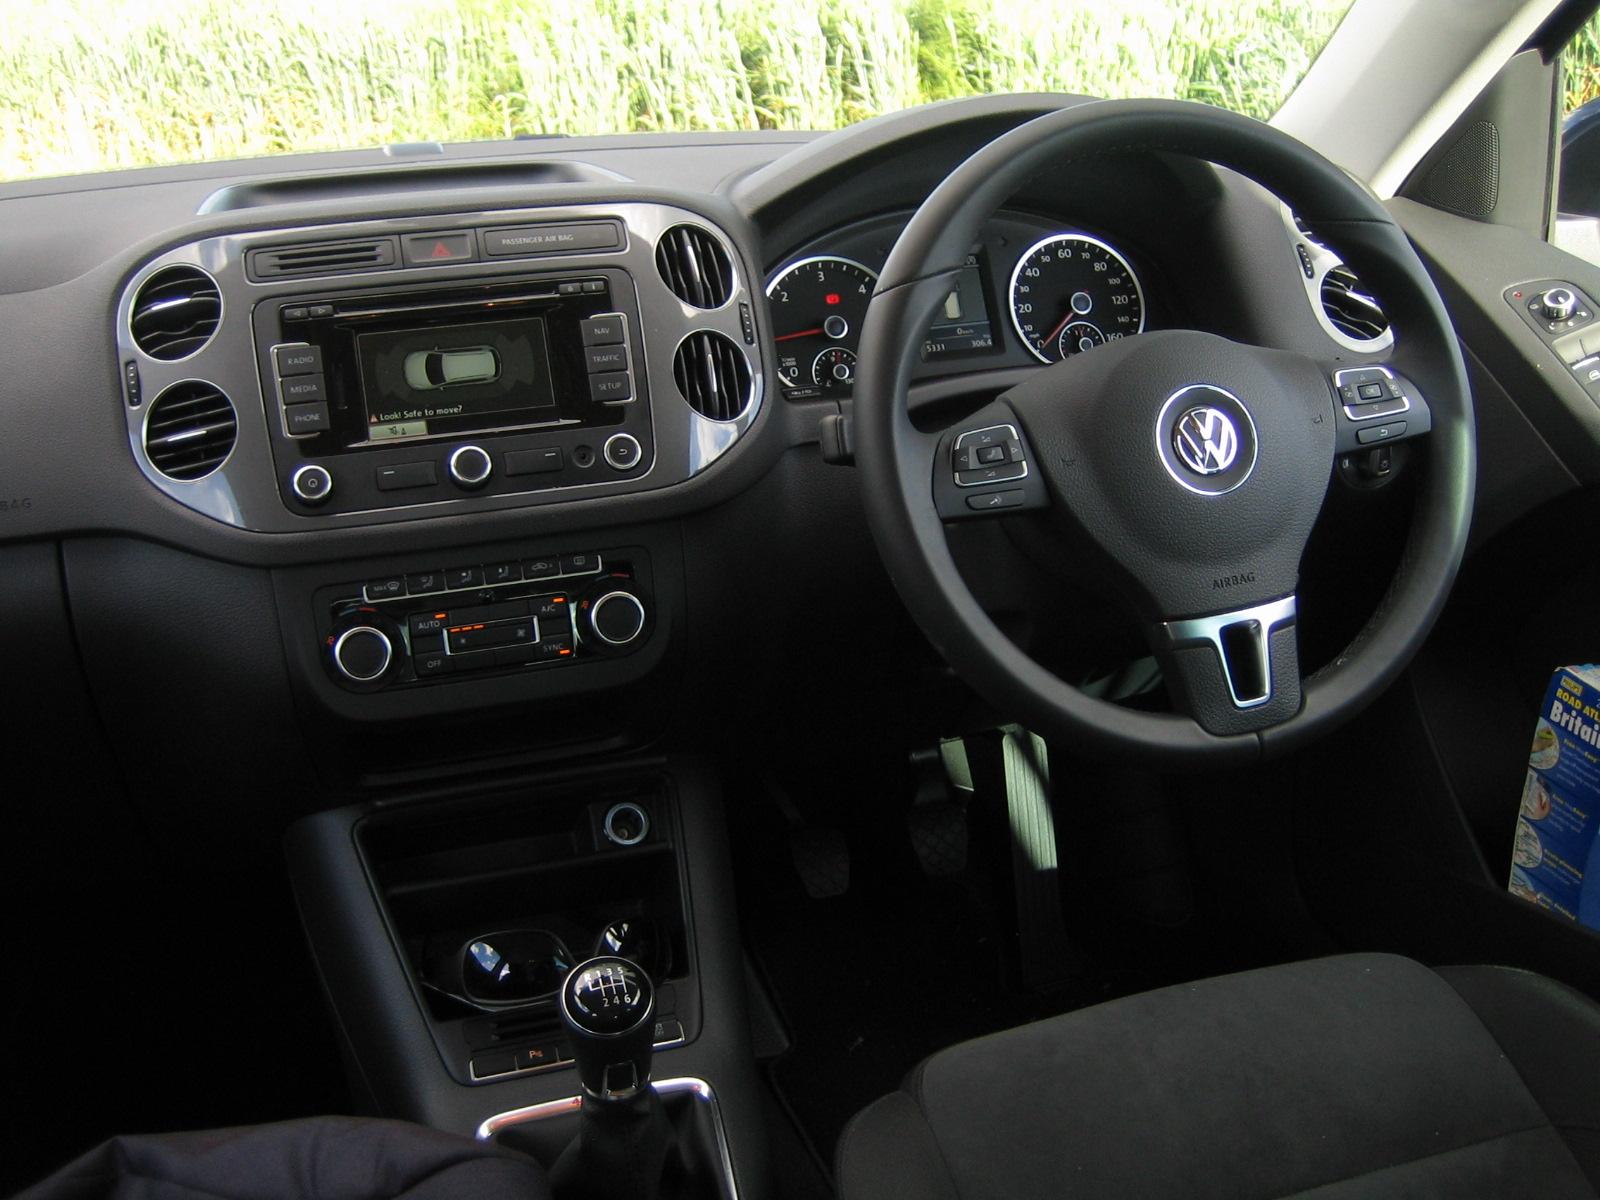 Volkswagen Tiguan Match 20 TDI review  road test report